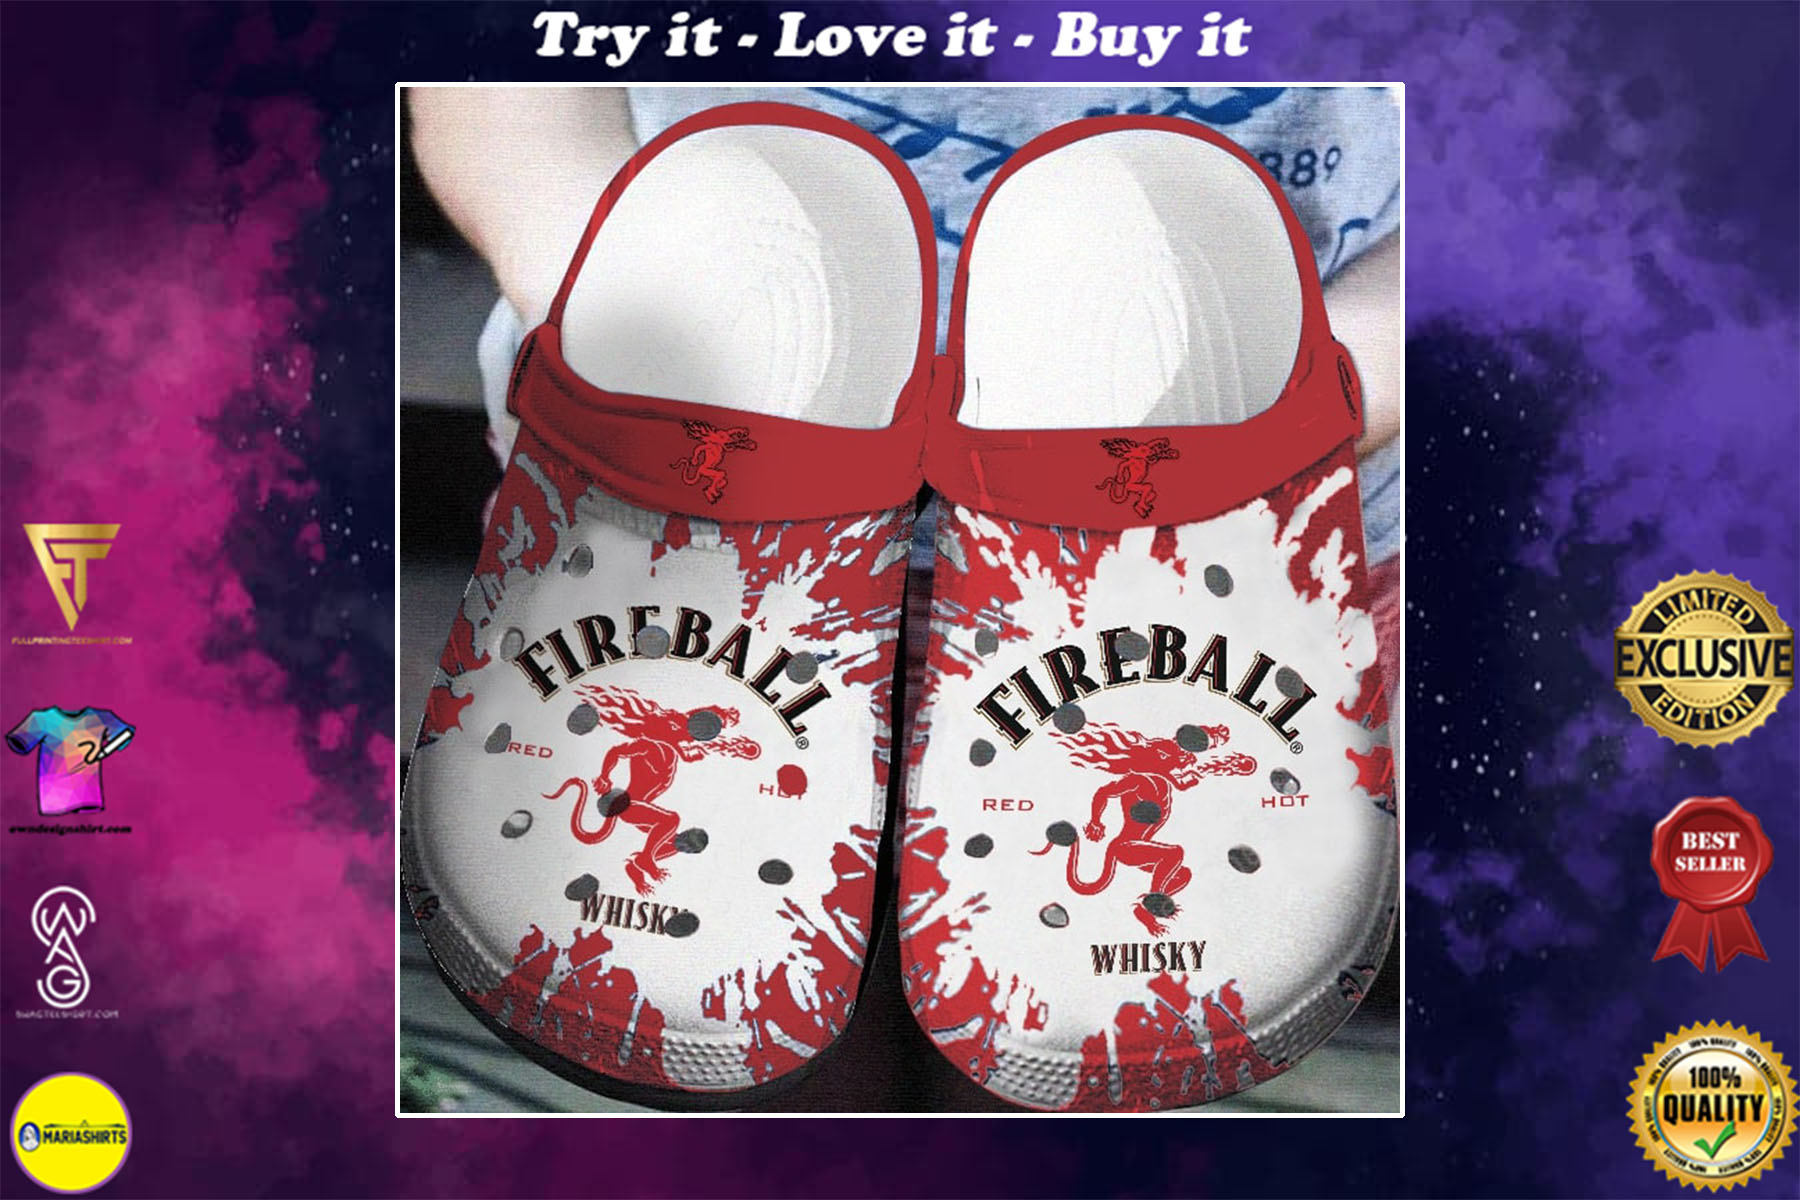 [special edition] fireball cinnamon whisky crocs shoes - maria